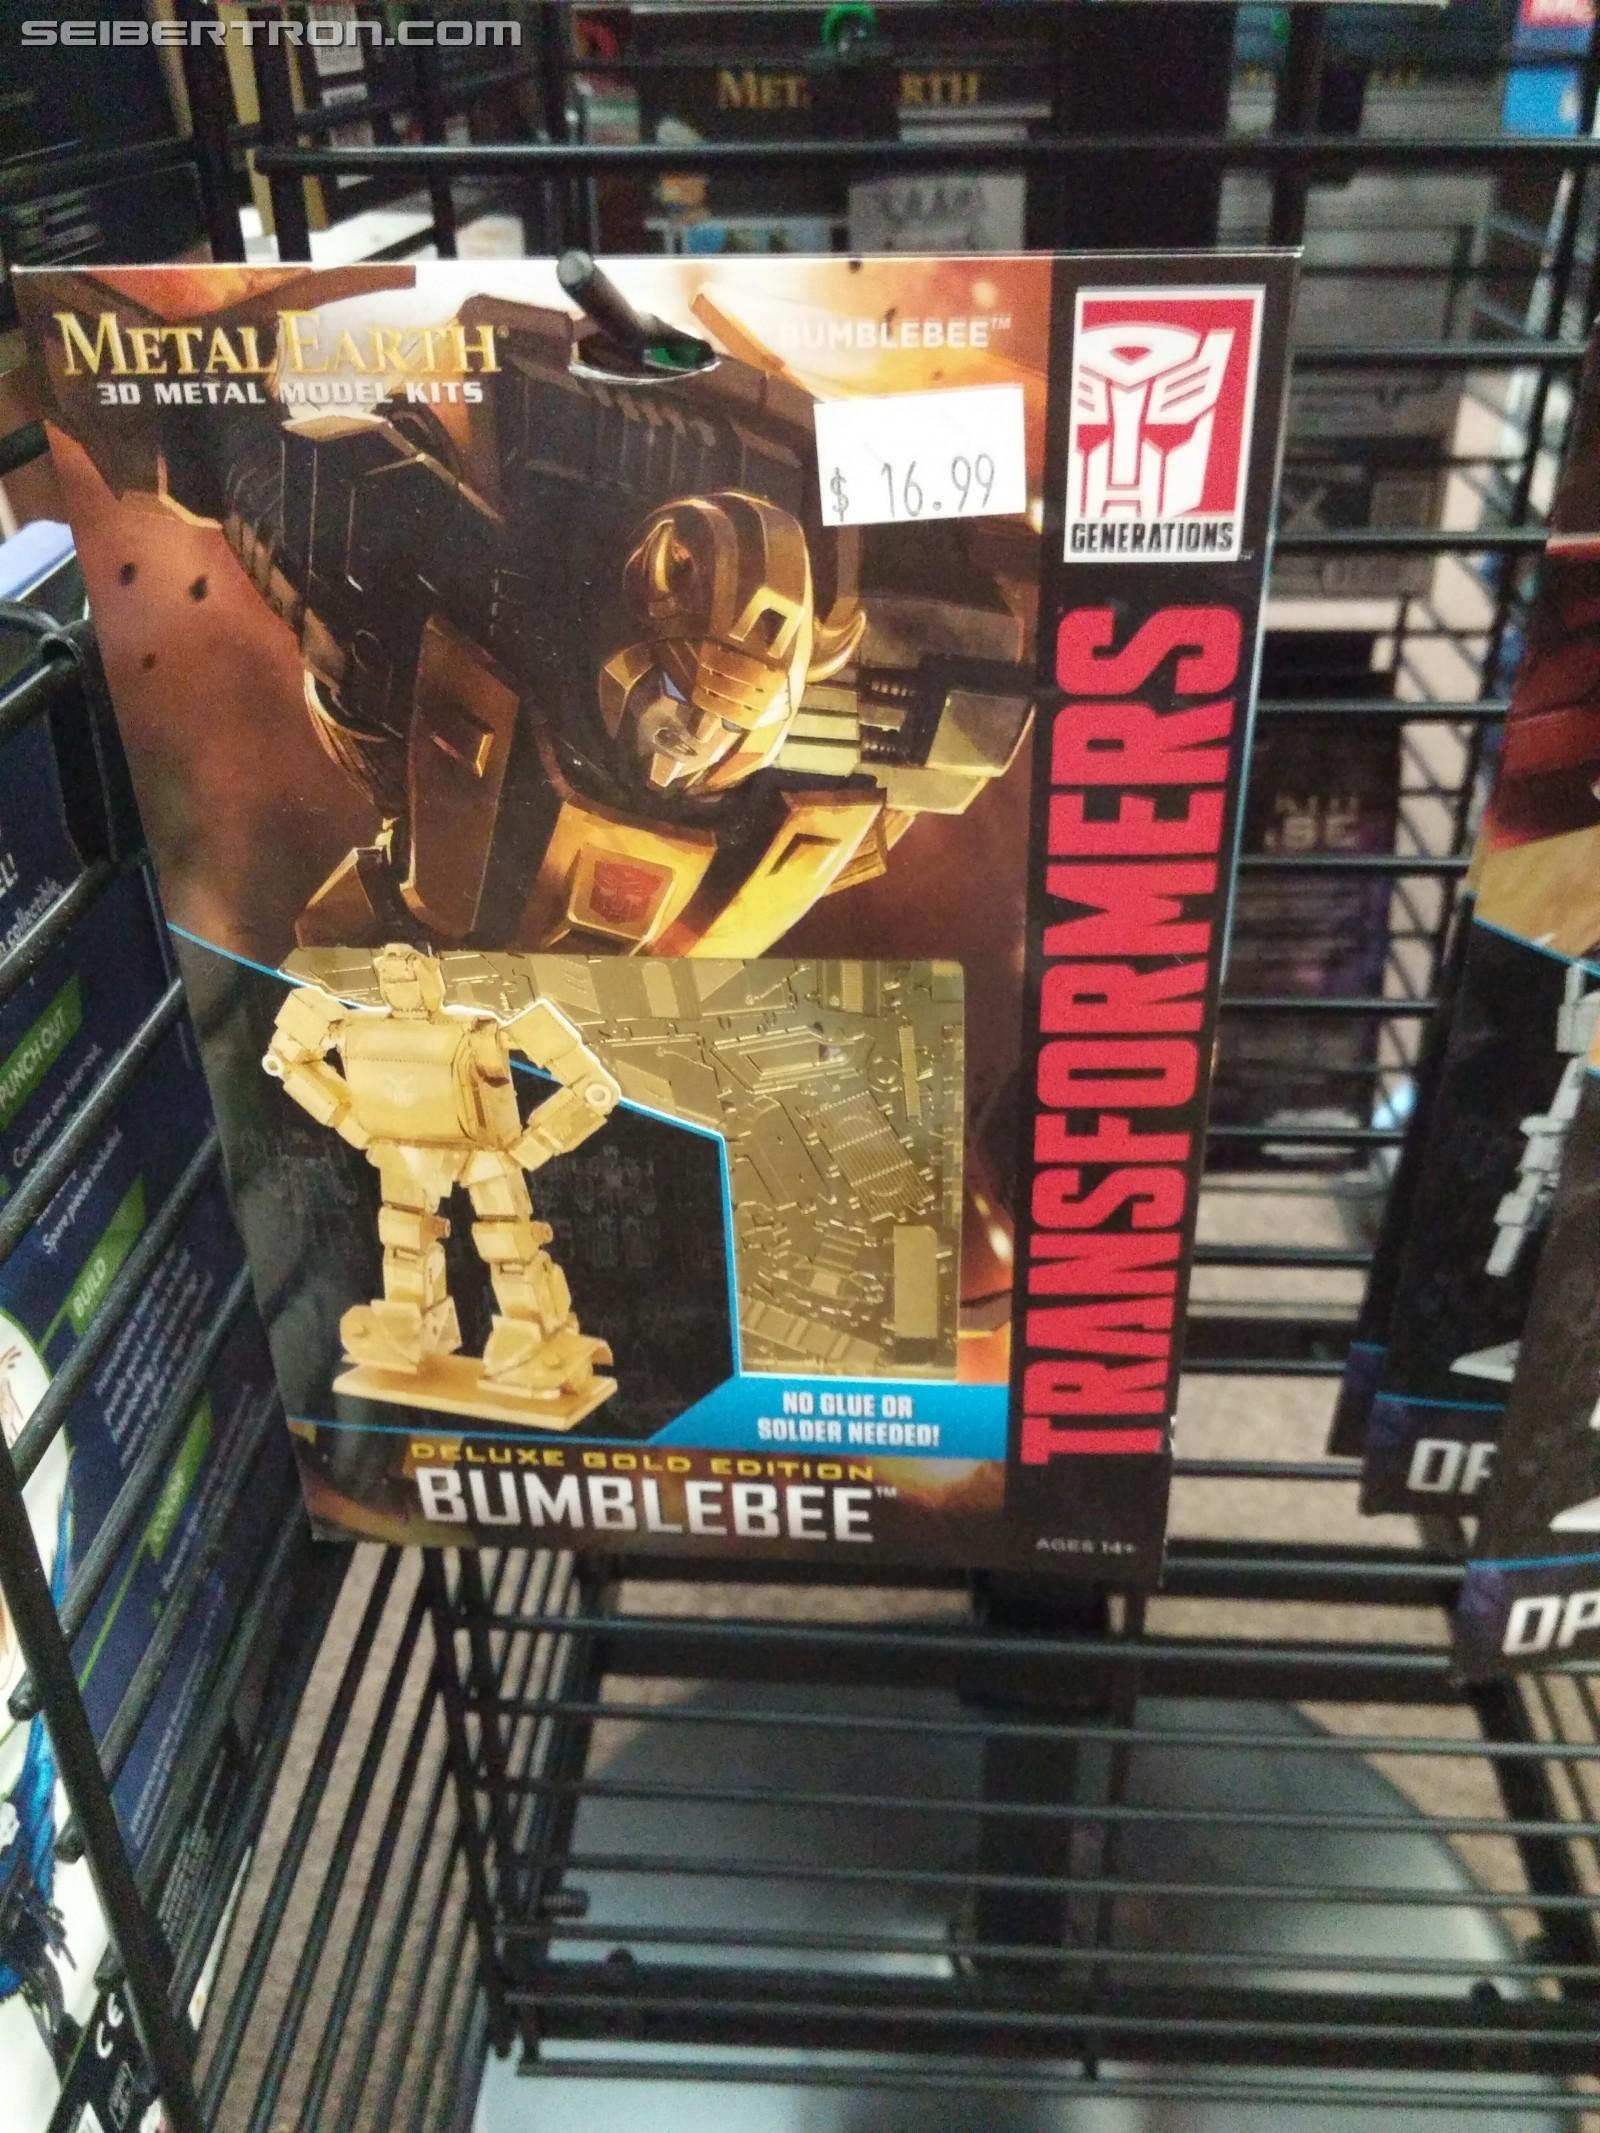 Transformers News: Re: Transformers Metal Earth 3D Models Thread